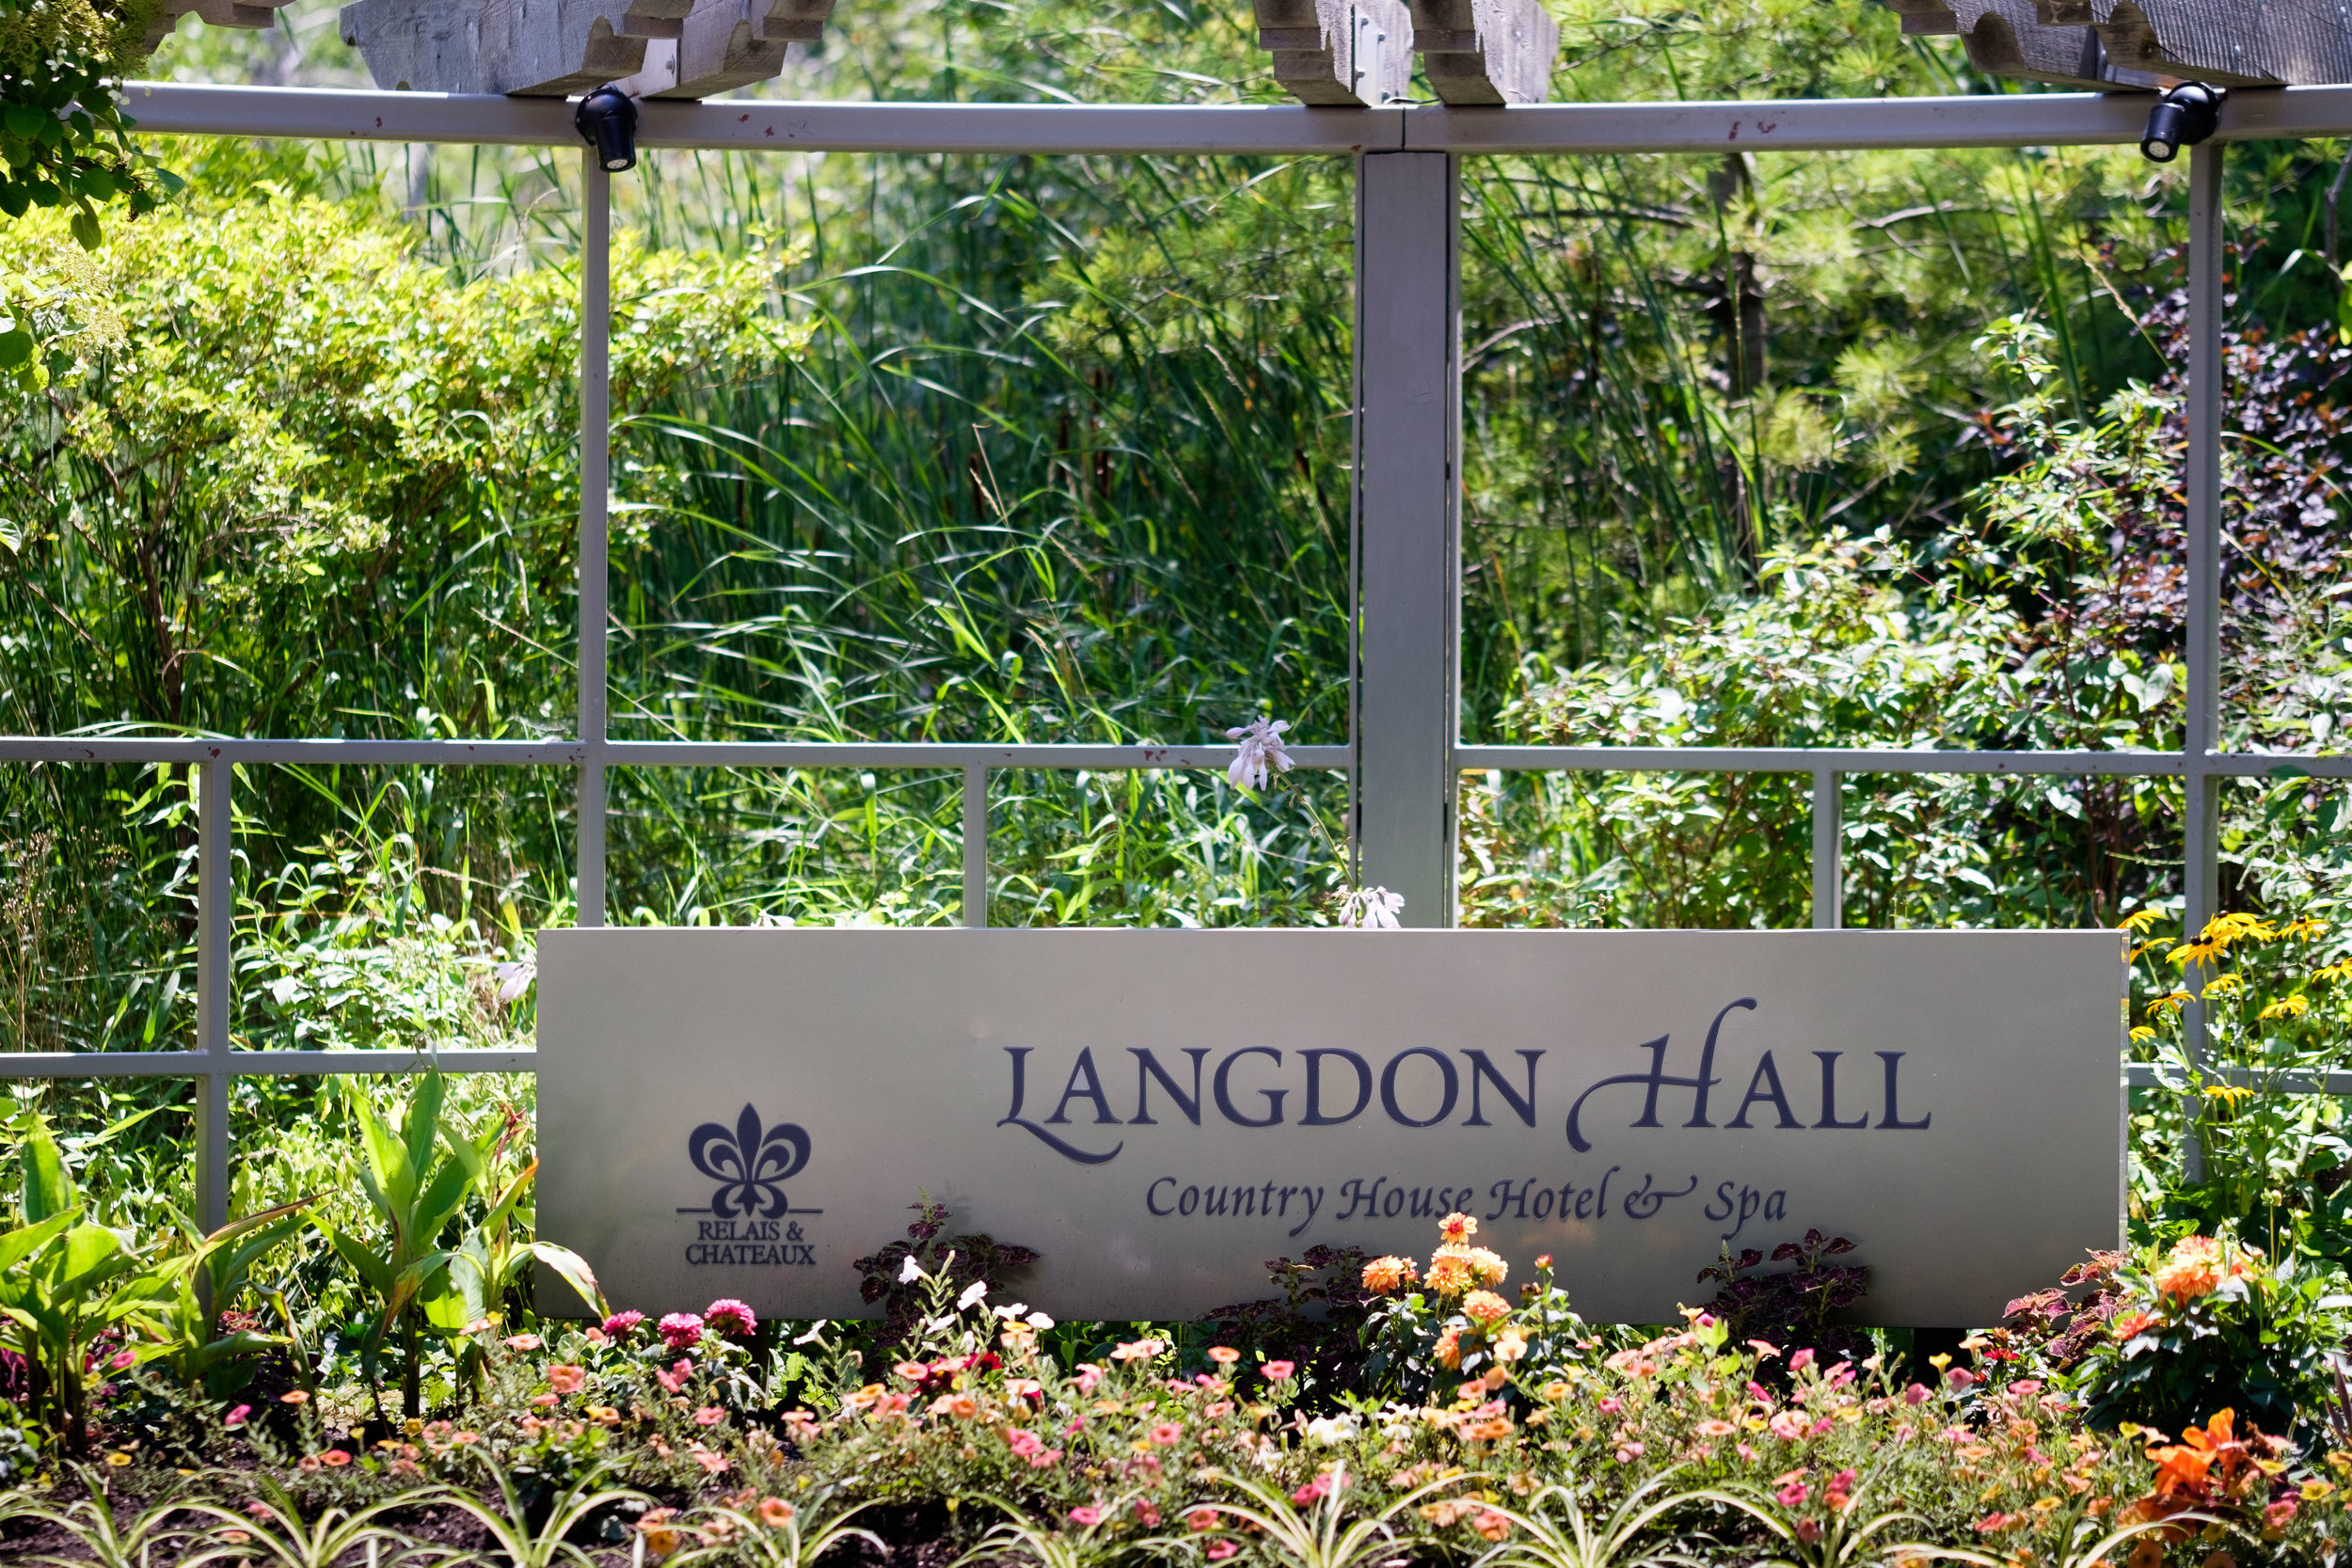 langdon-hall-entrance-sign.jpg